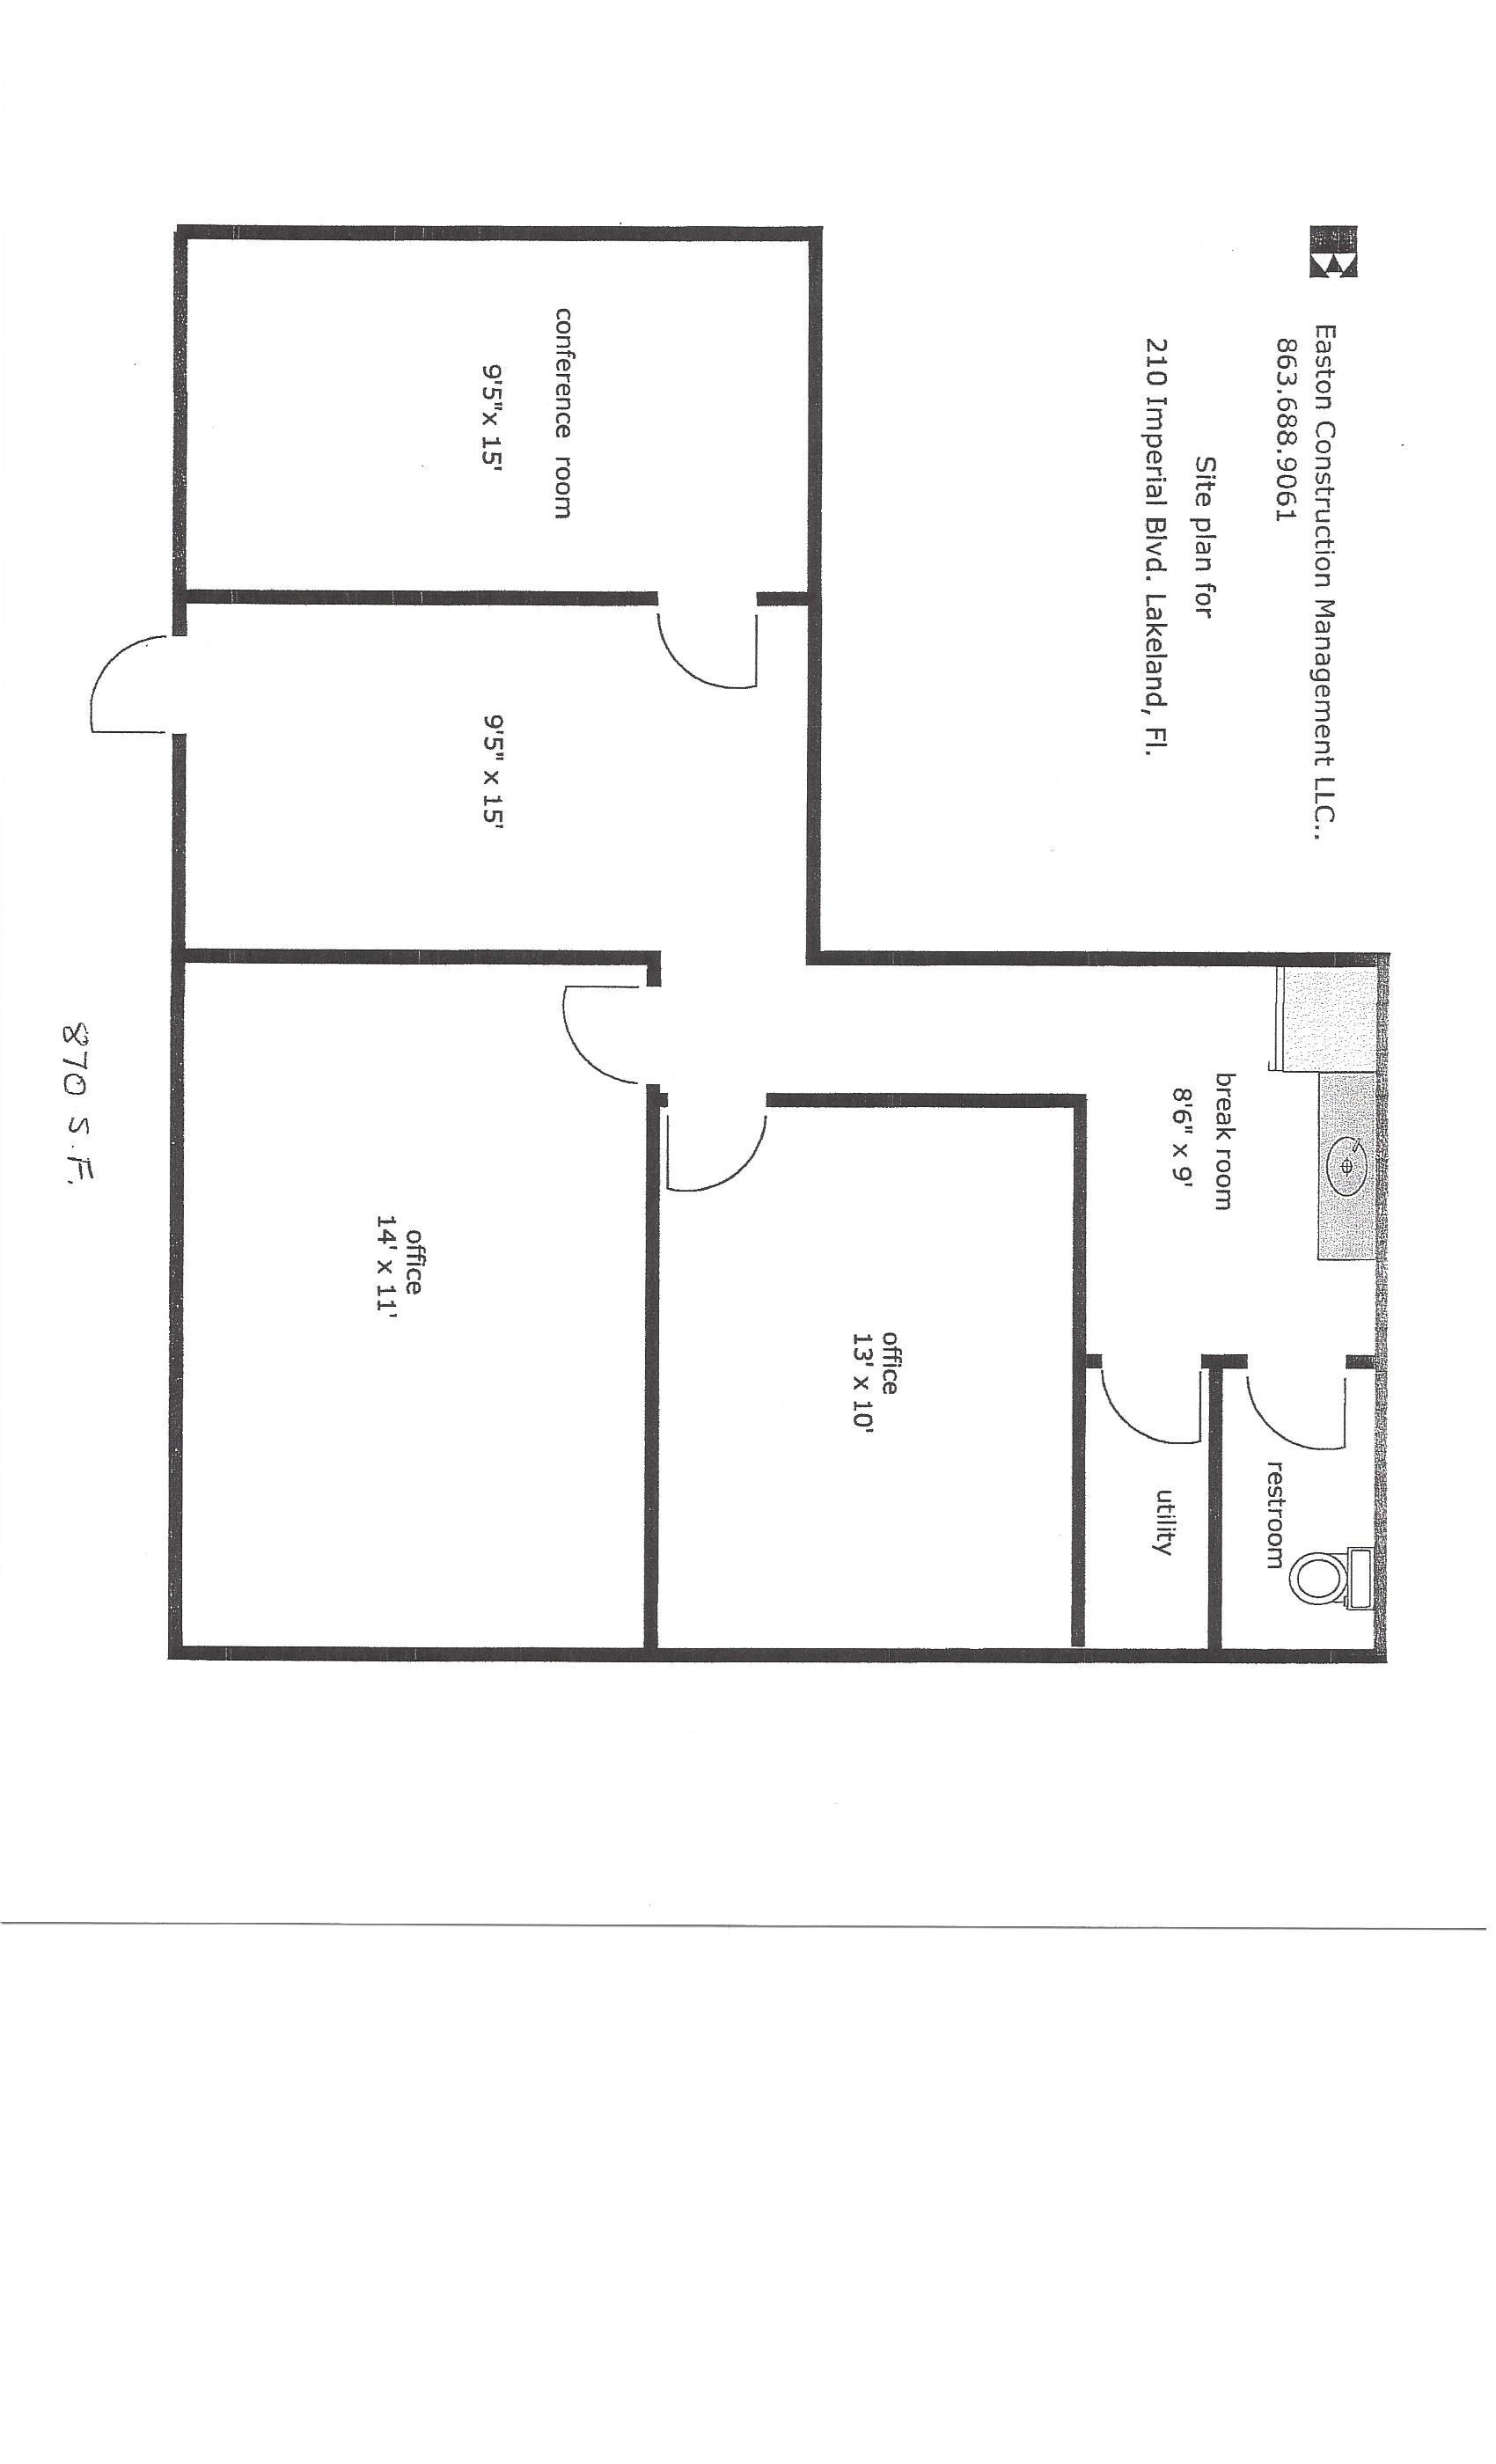 Lakeland Center Conference Room Floor Plan